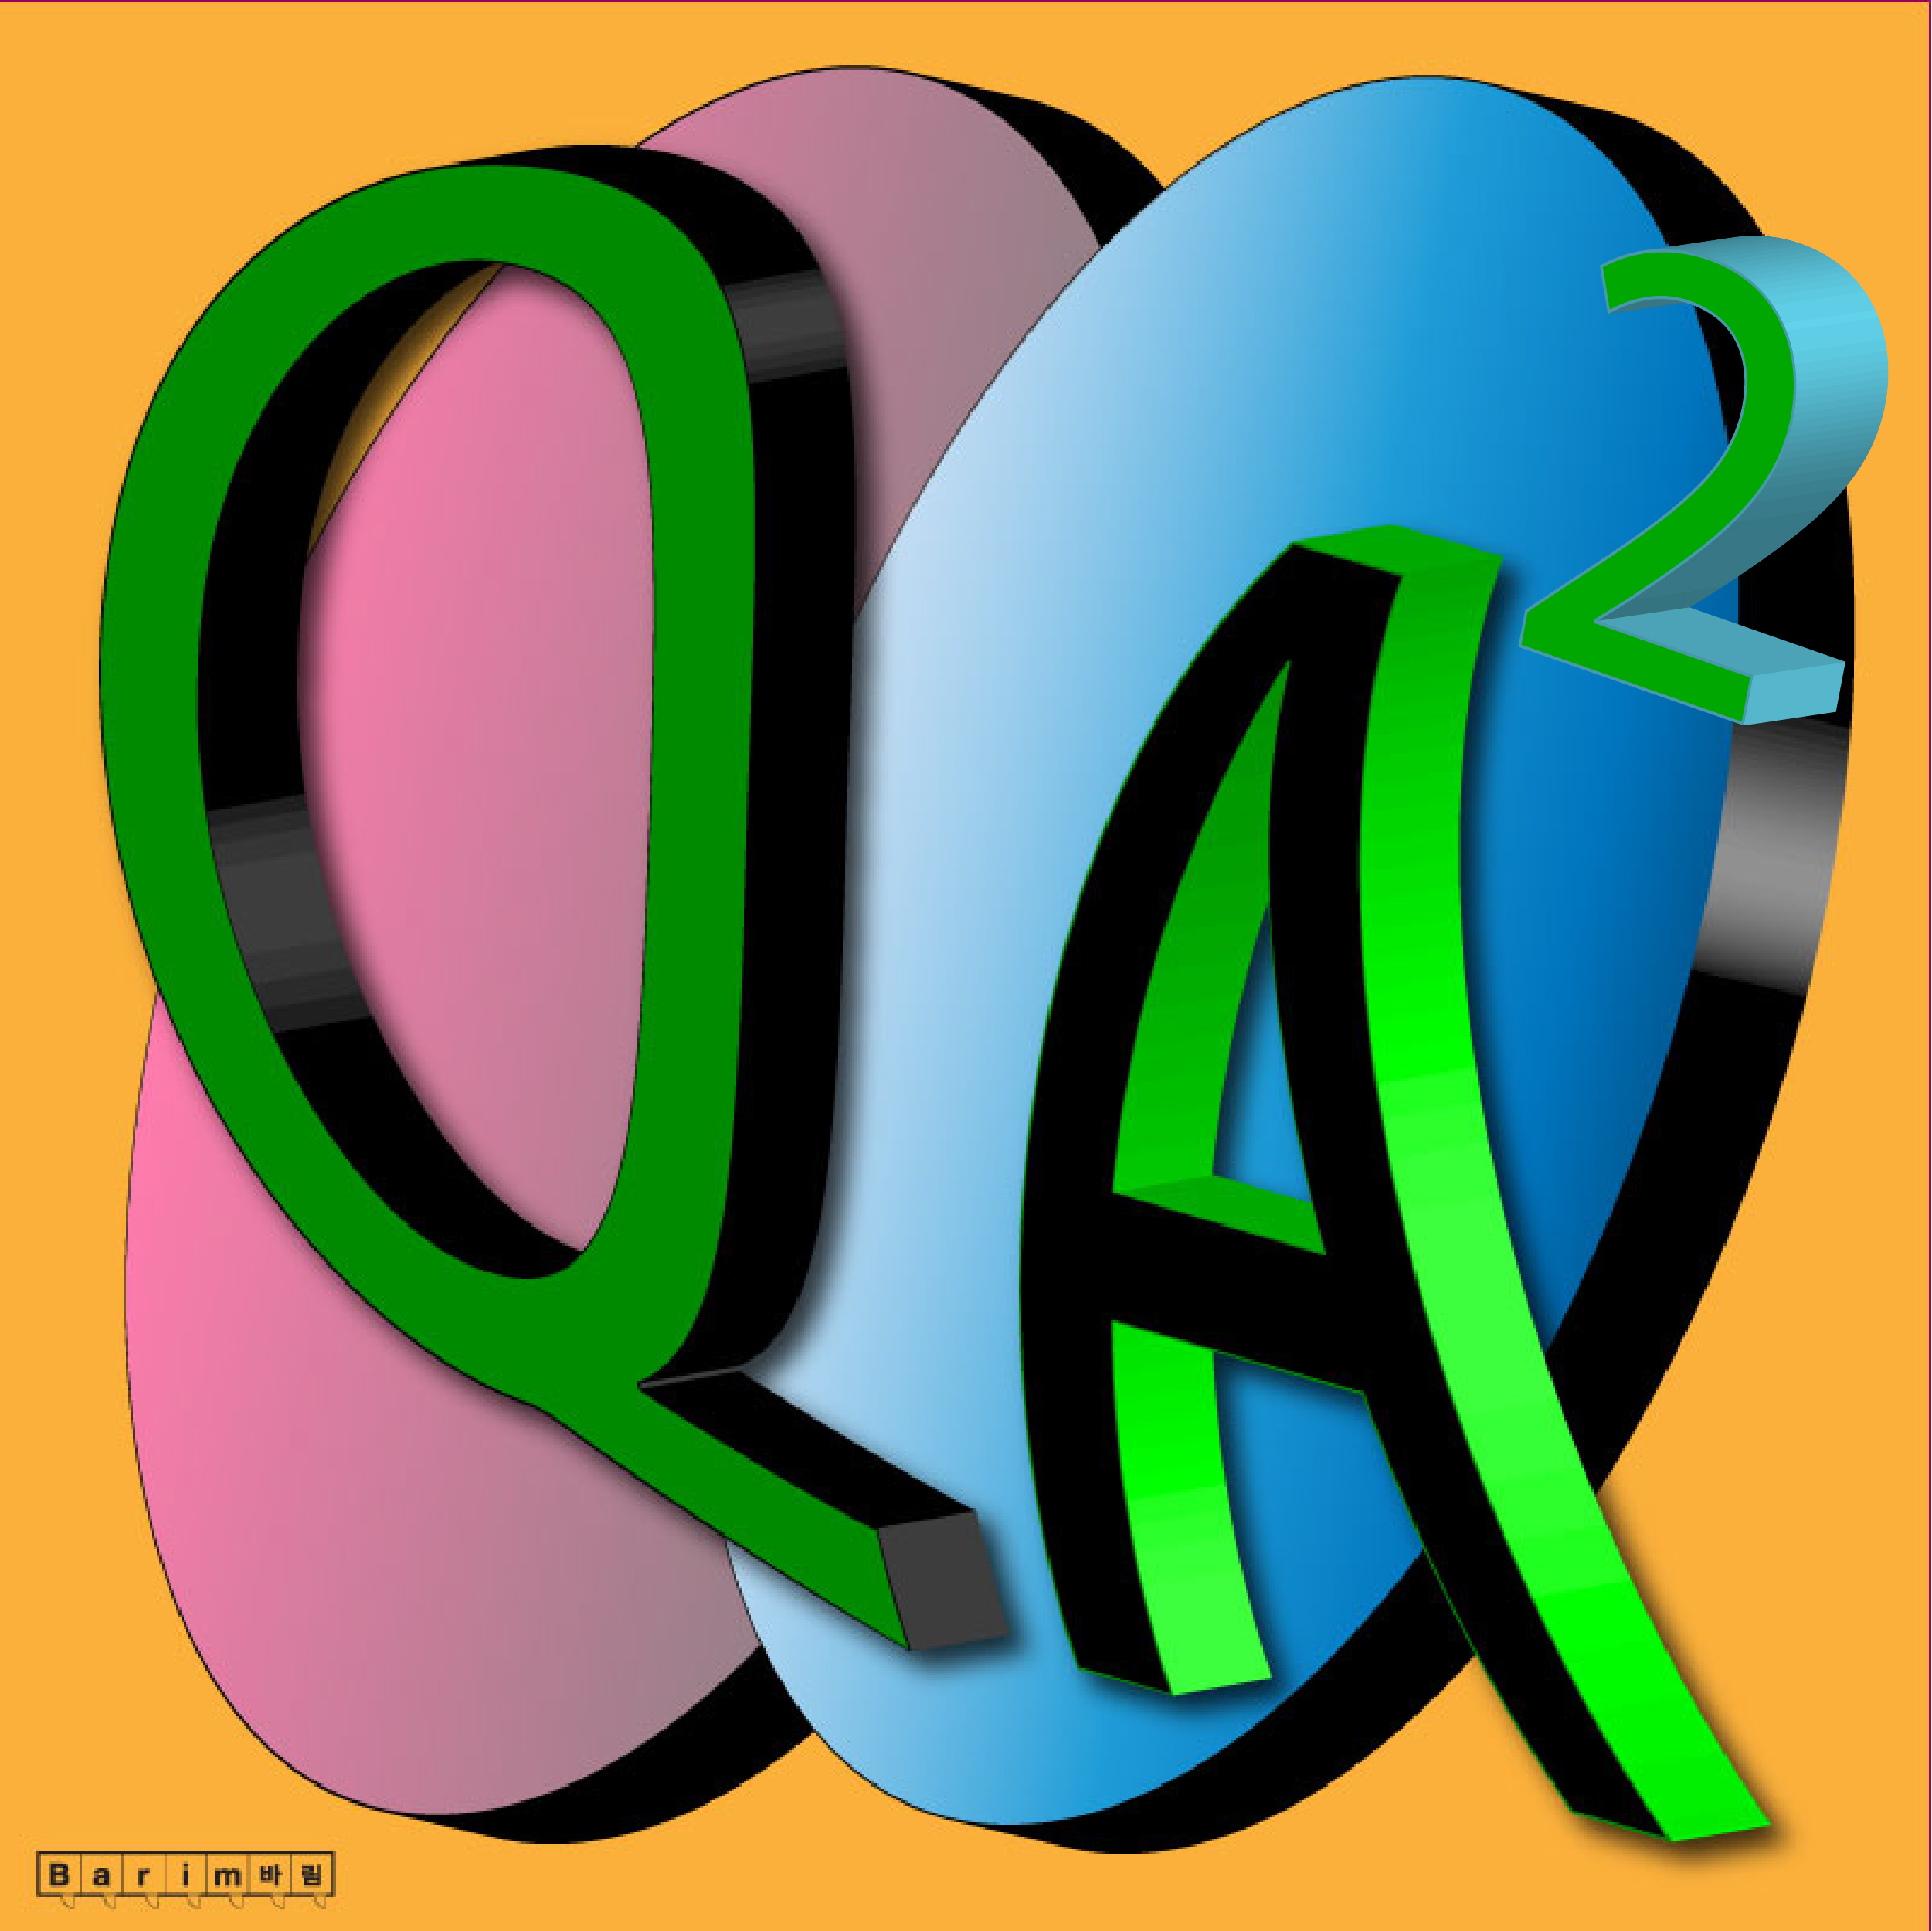 qa-03